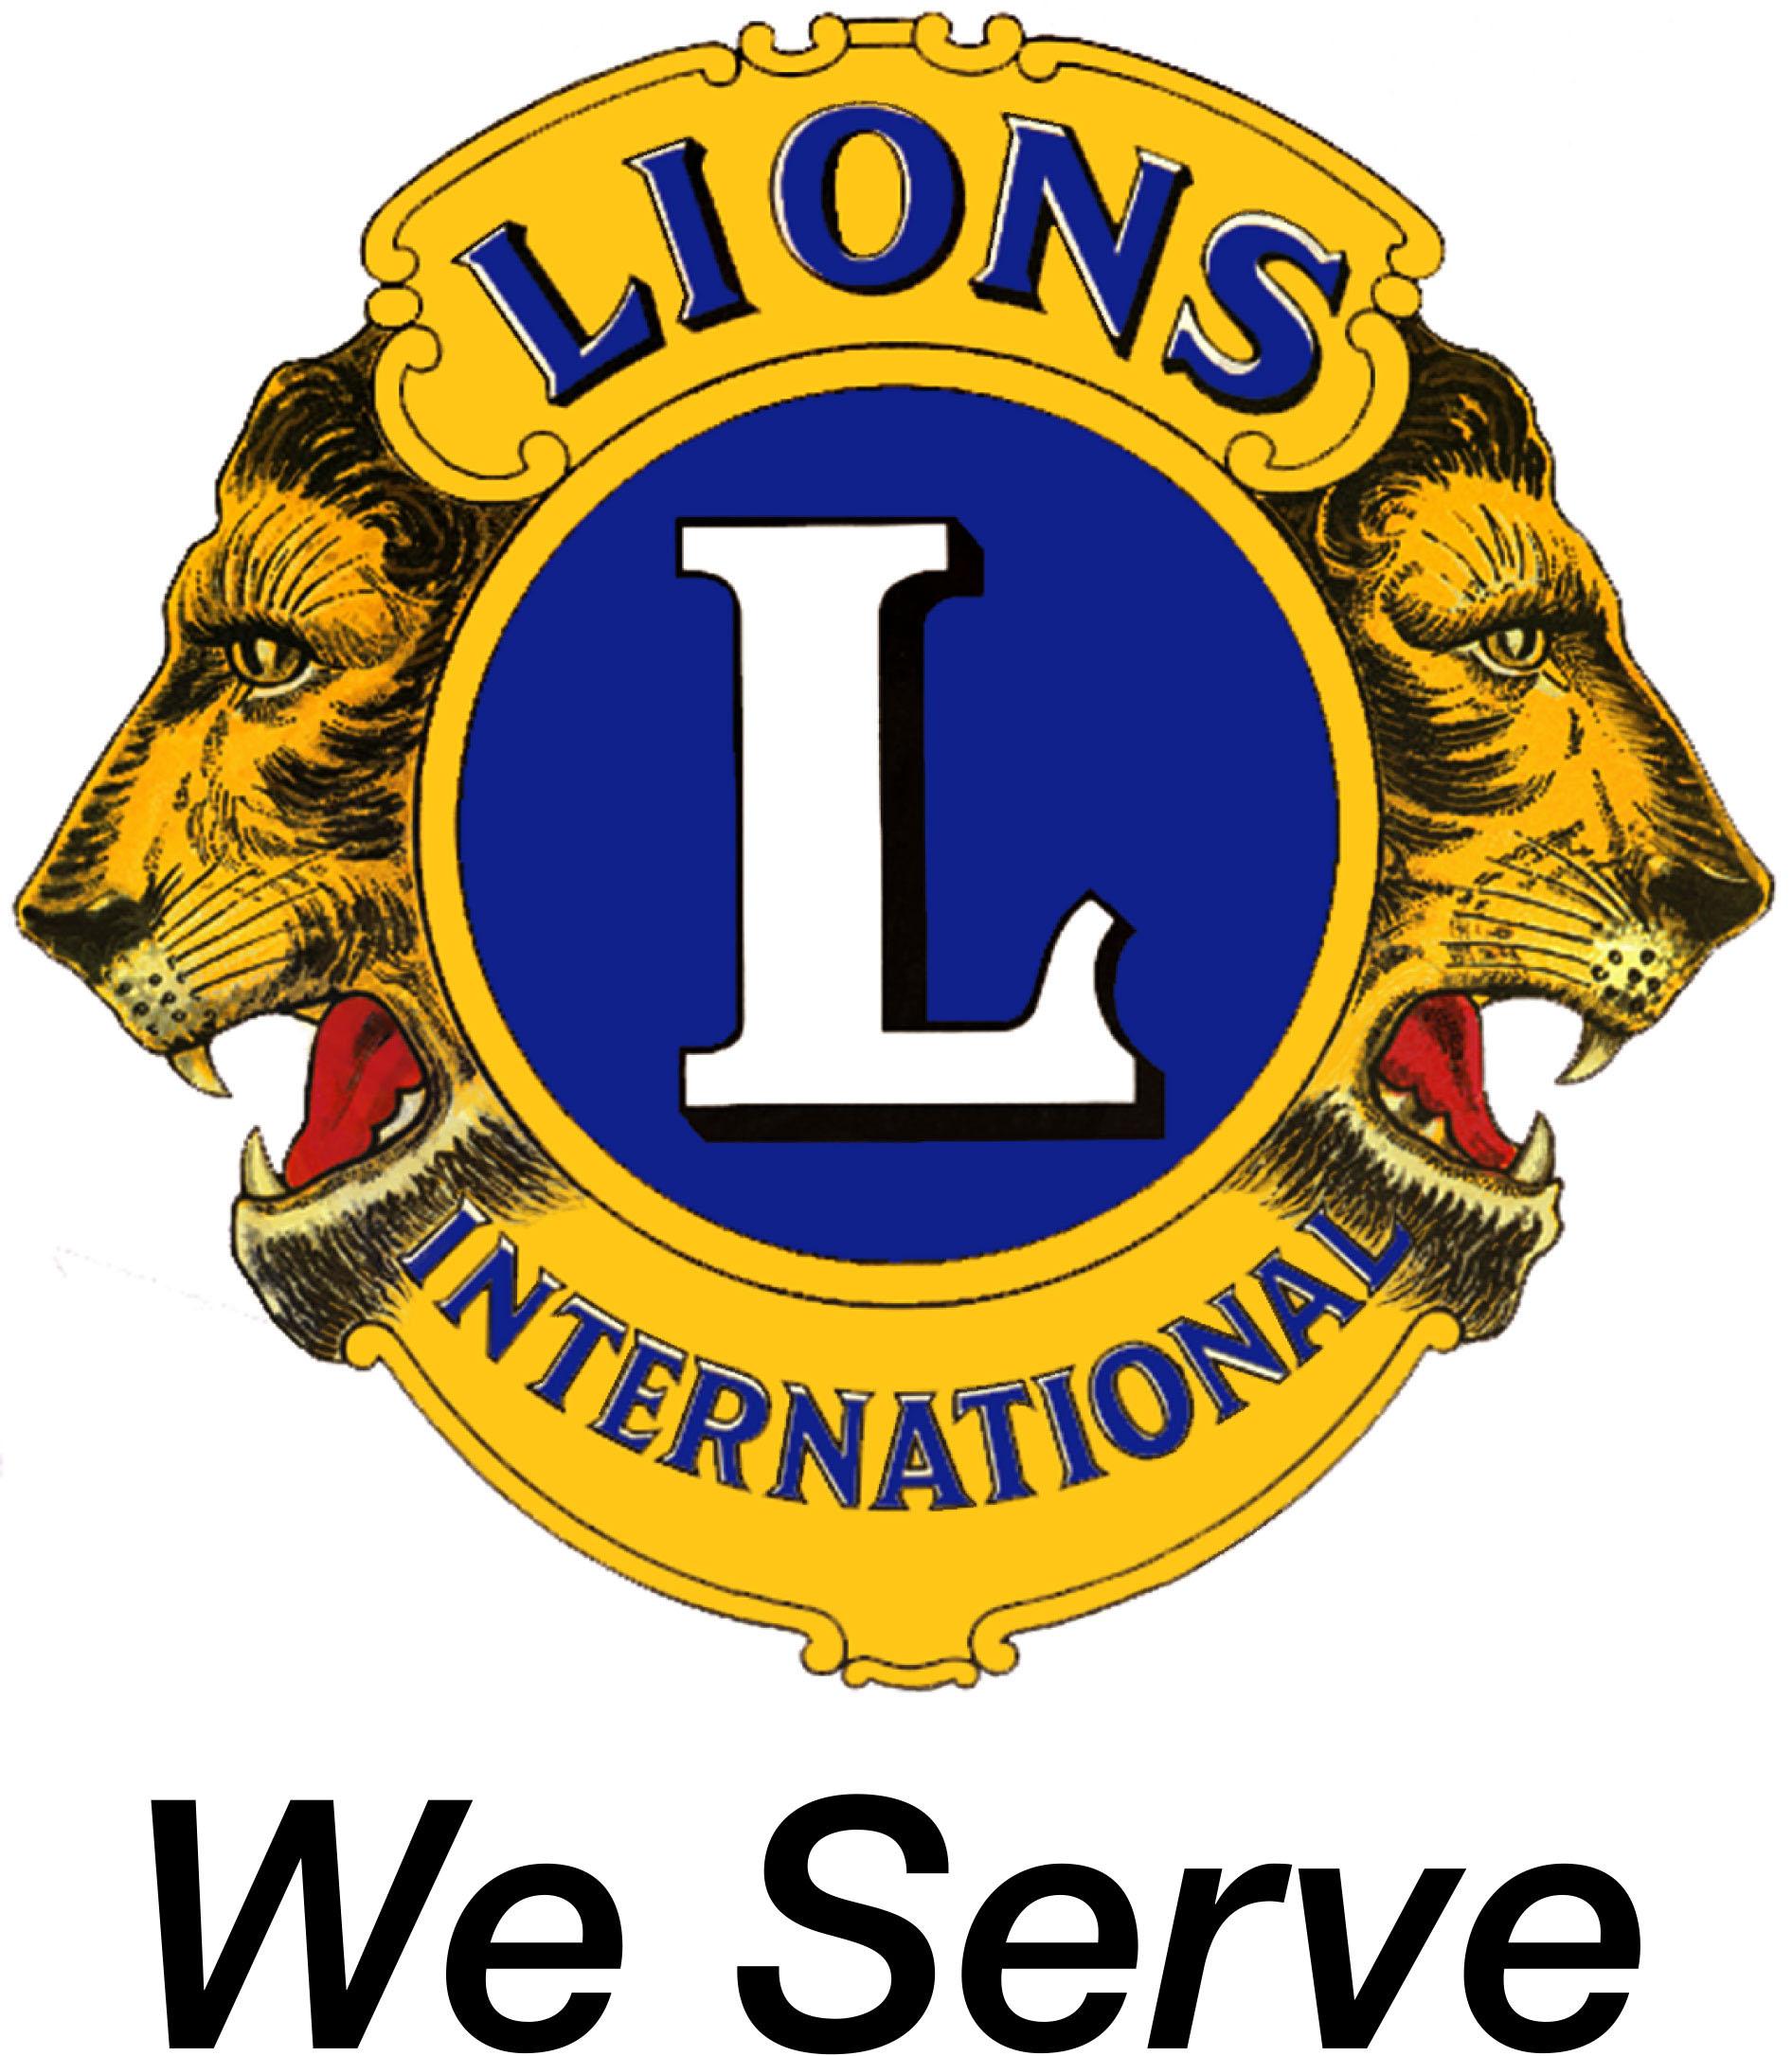 Lions club international Logos